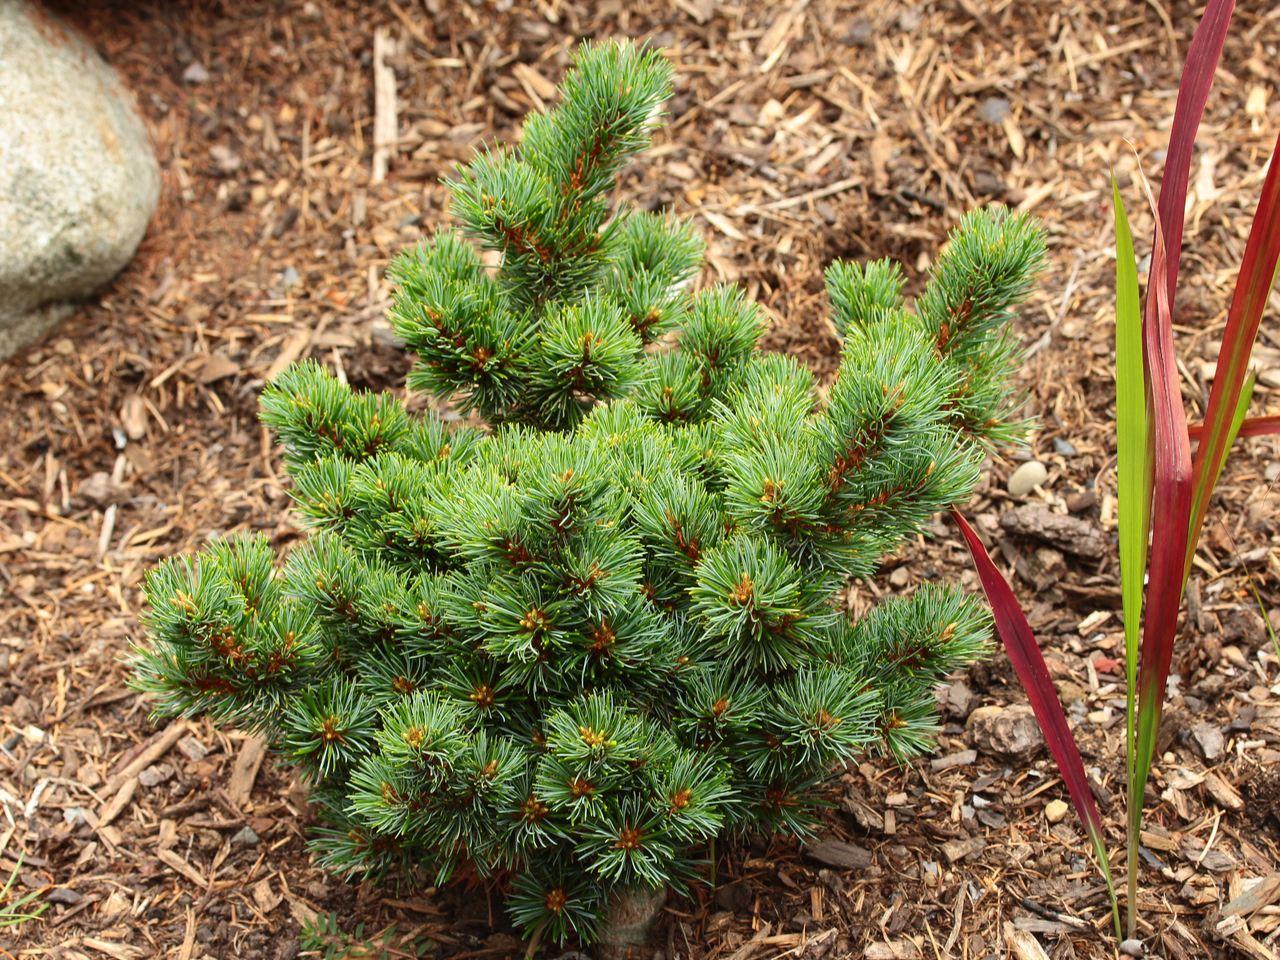 Pinus parviflora Catherine Elizabeth pine conifer evergreen irregular dwarf Japanese White pine blue green twisted needles